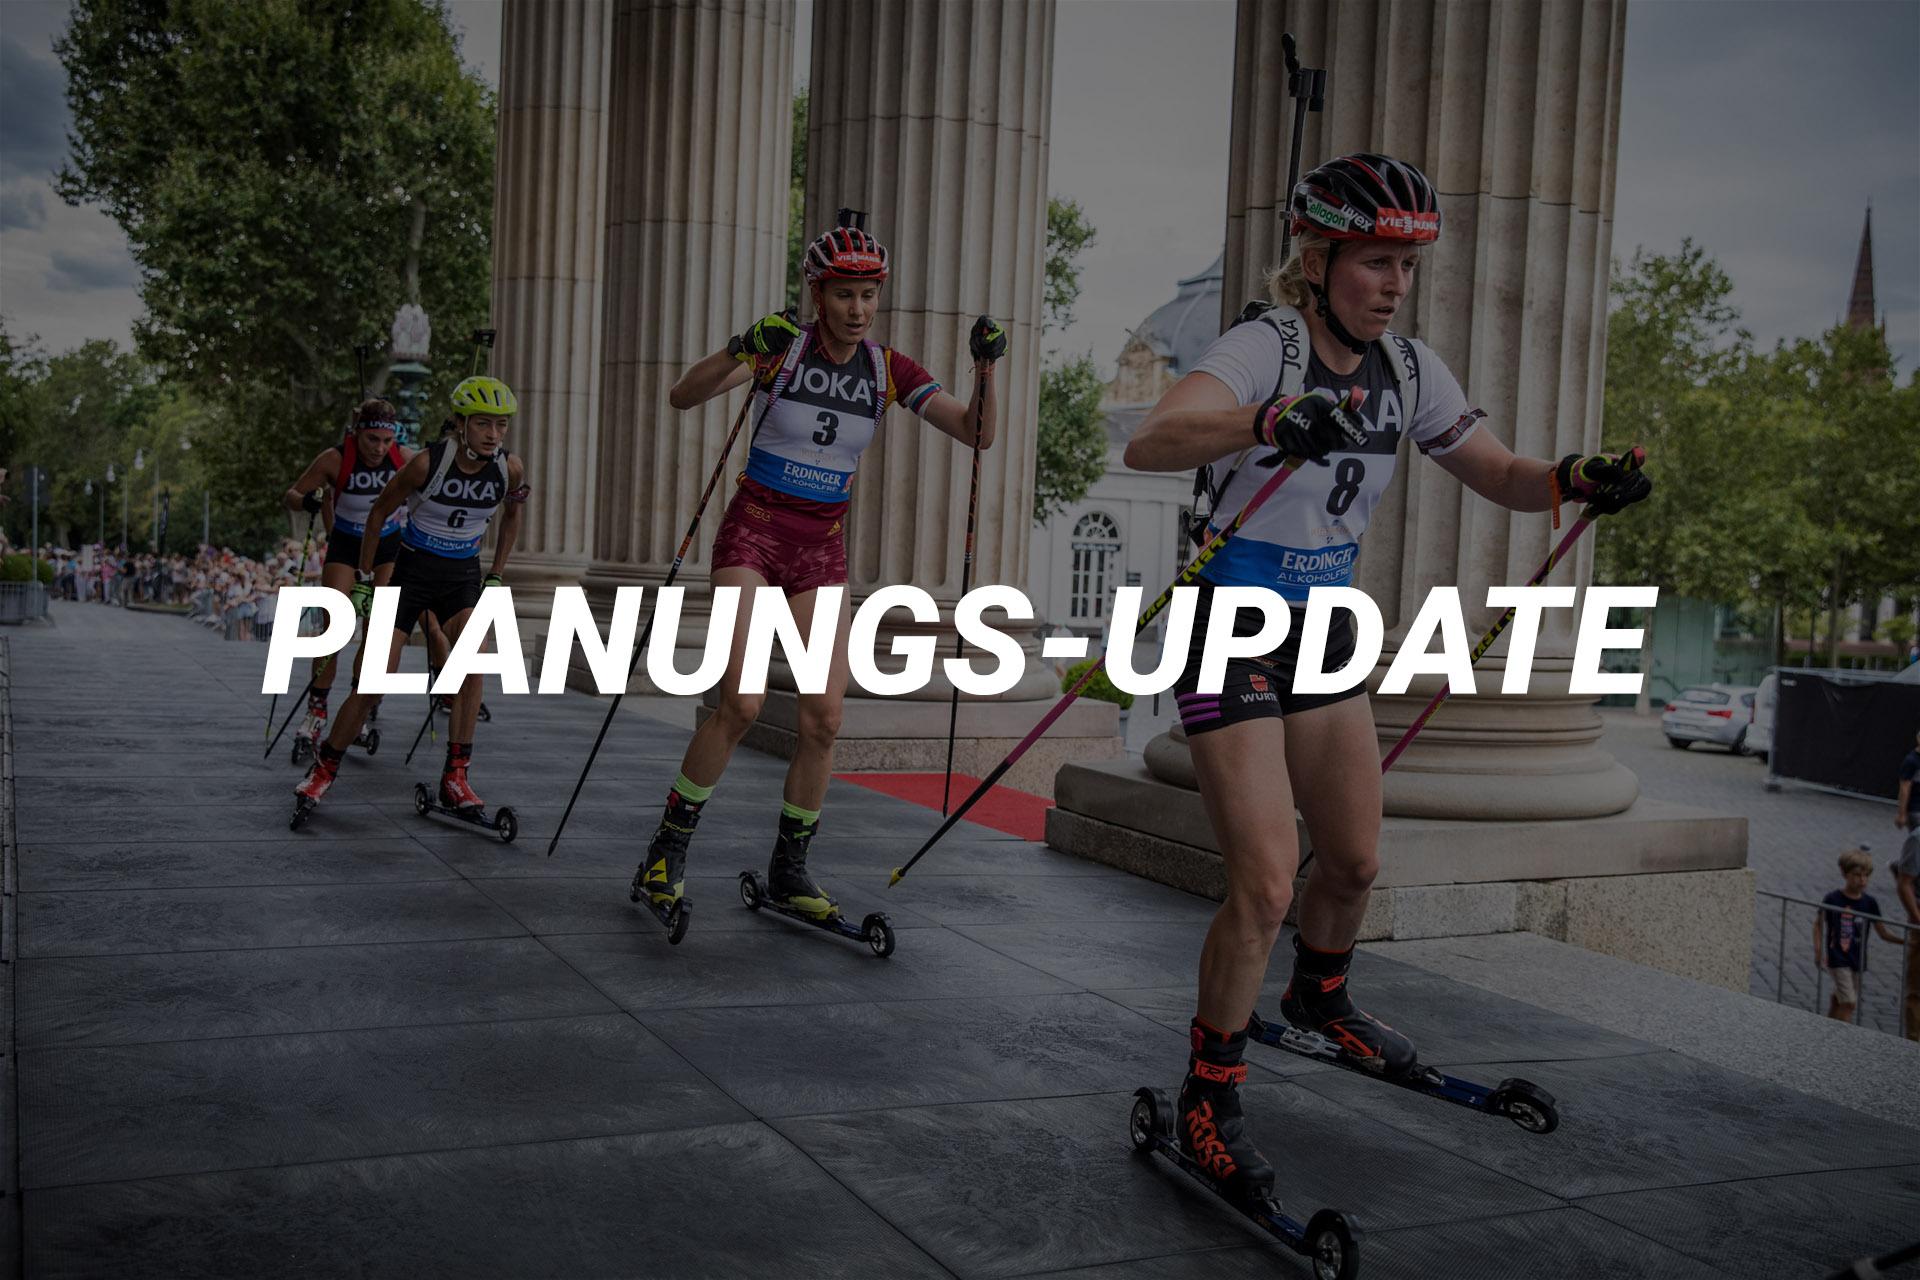 Planungs-Update